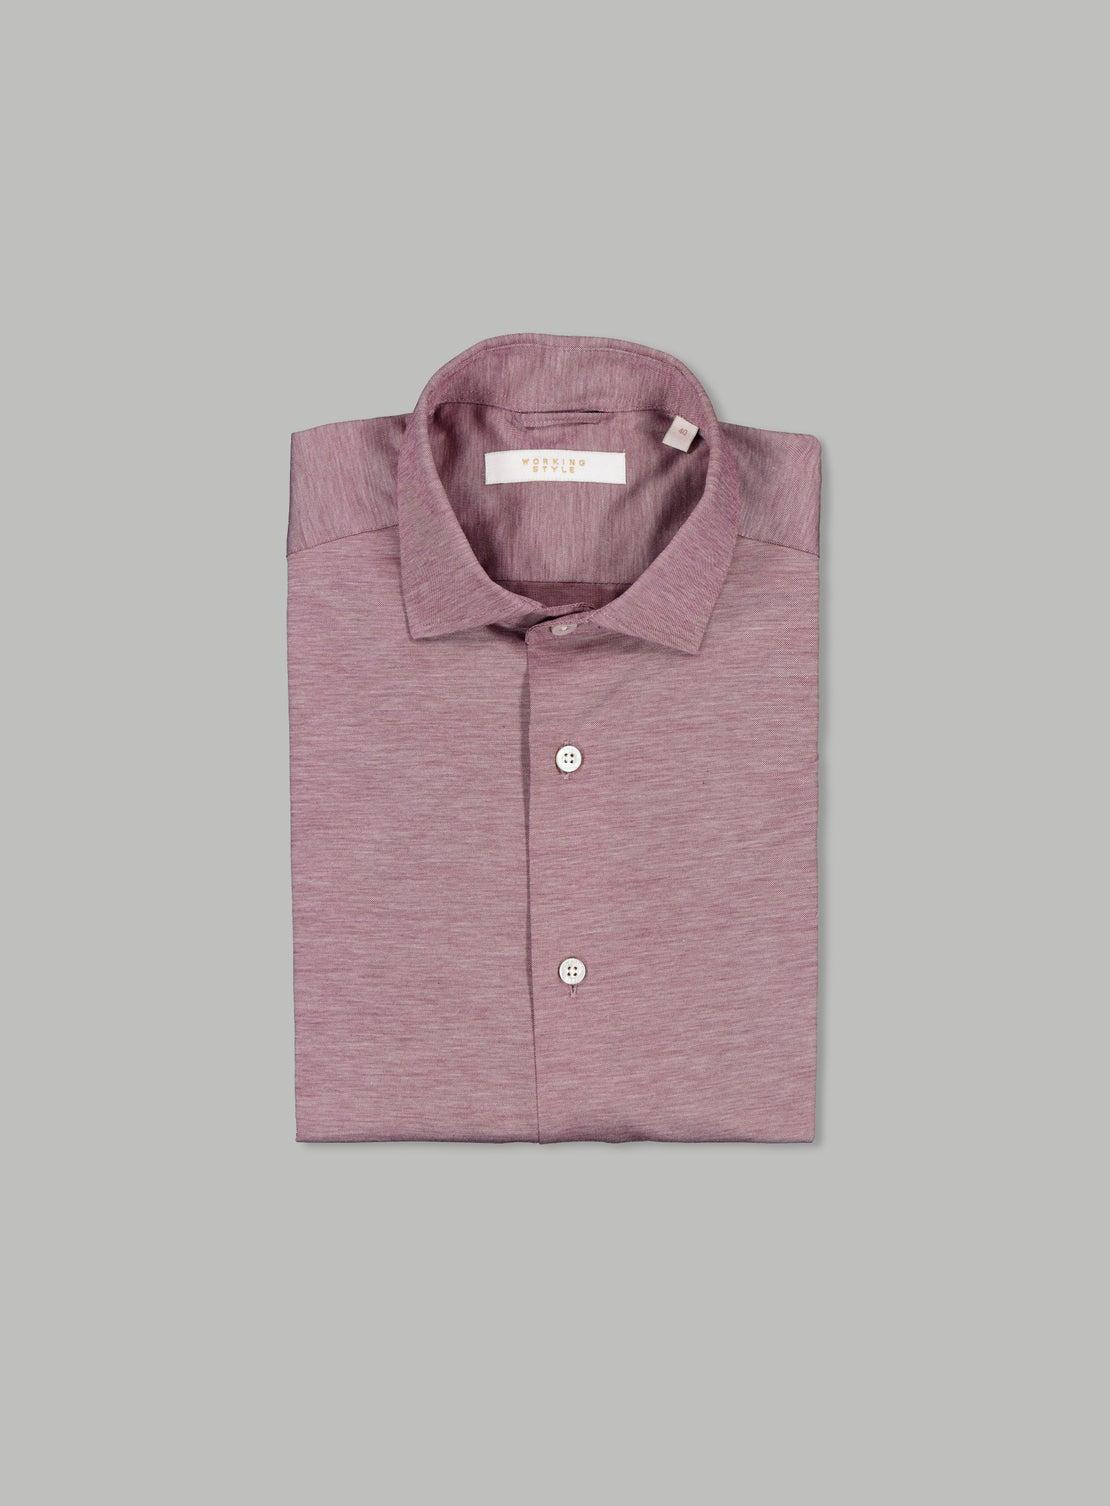 Jackson Red Knited Shirt